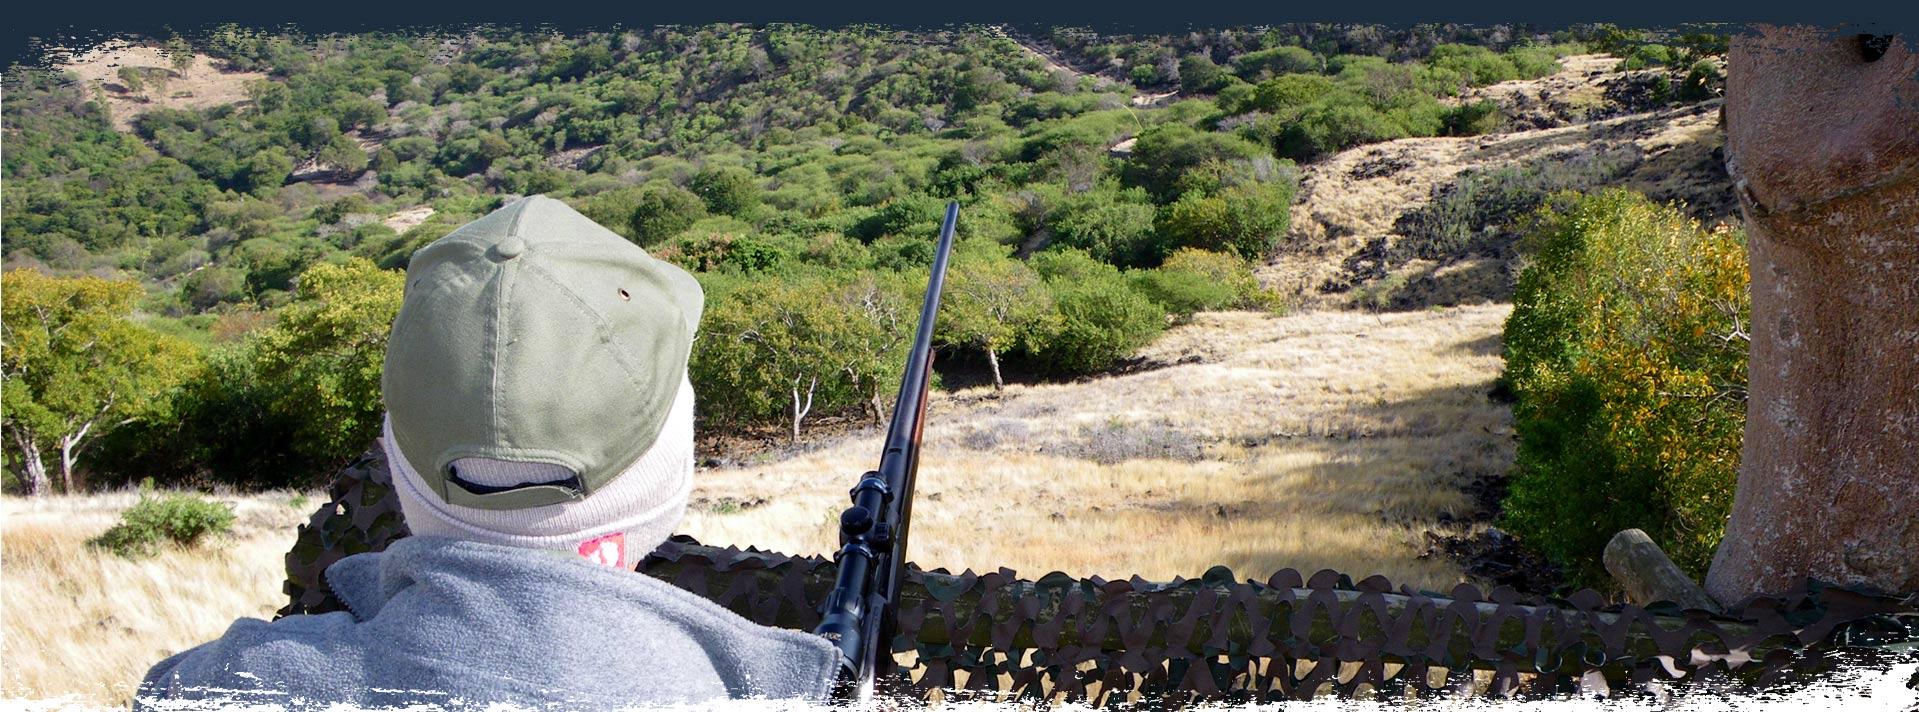 Mauritius fishing and hunting safaris for Fishing and hunting